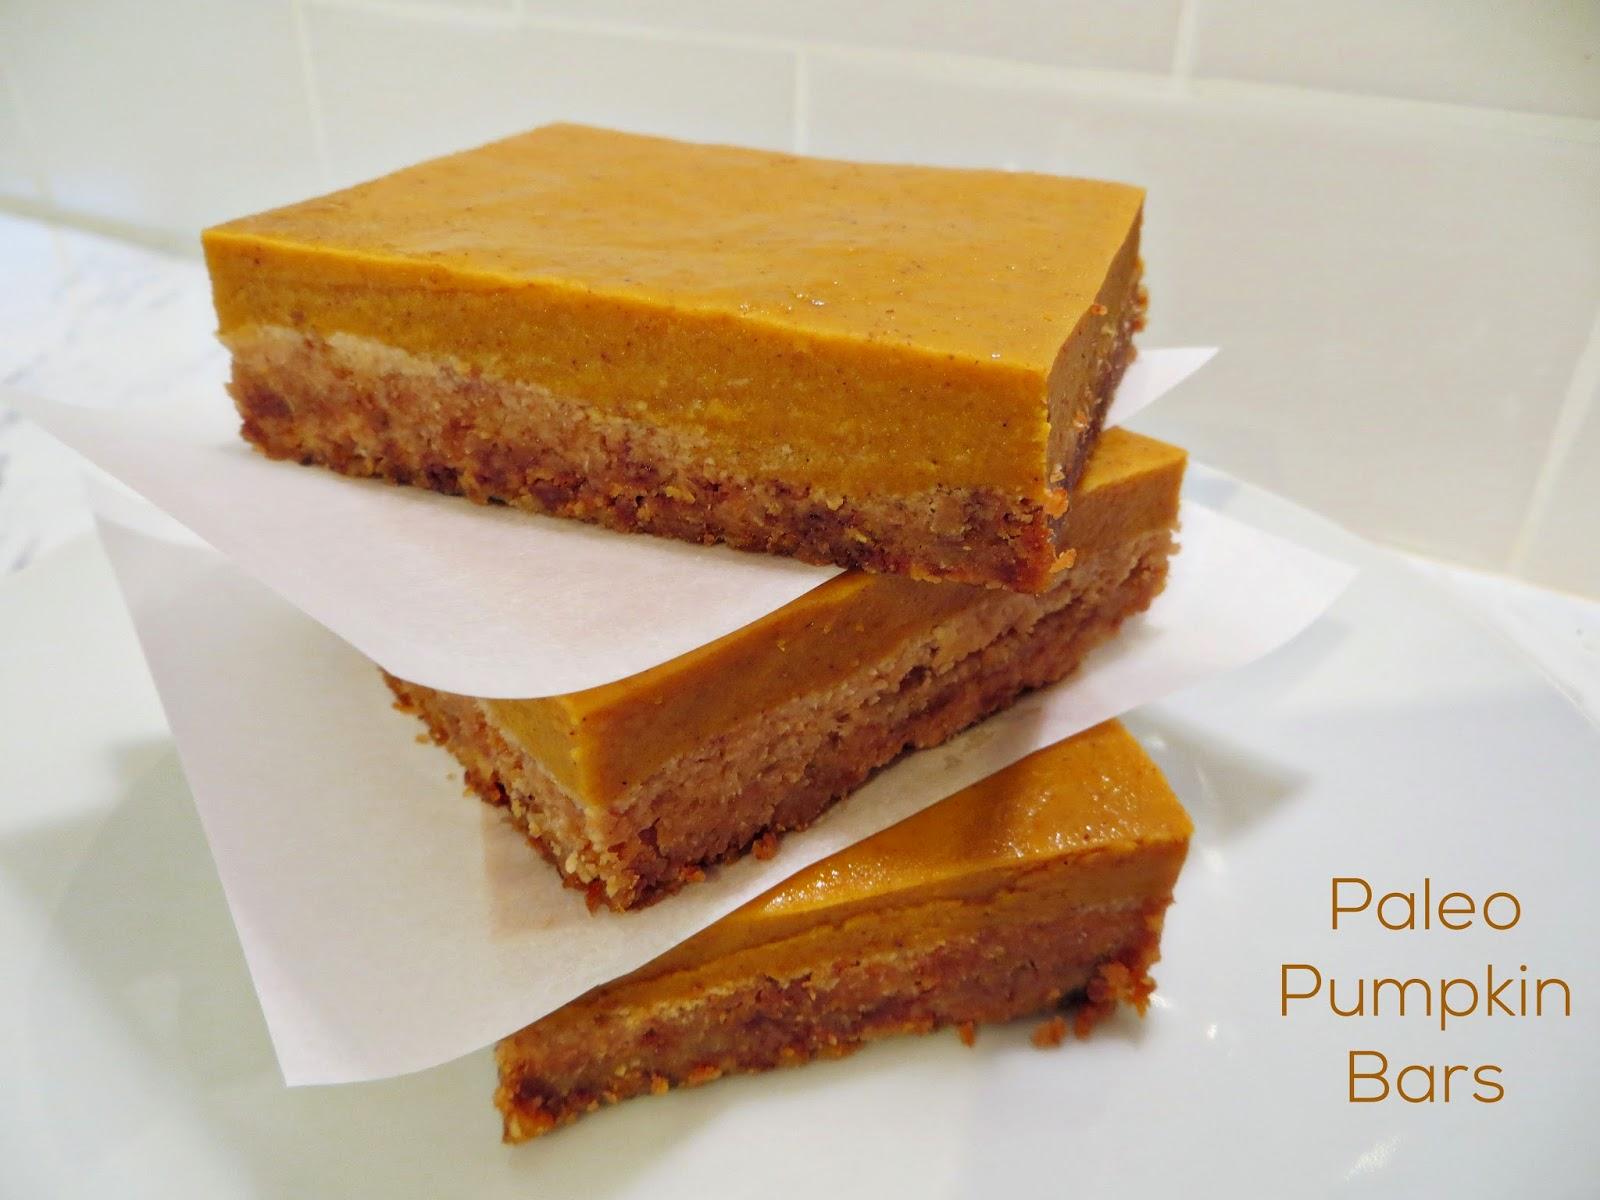 paleo pumpkin bars serious paleo pumpkin bars recipe pumpkin pie bars ...